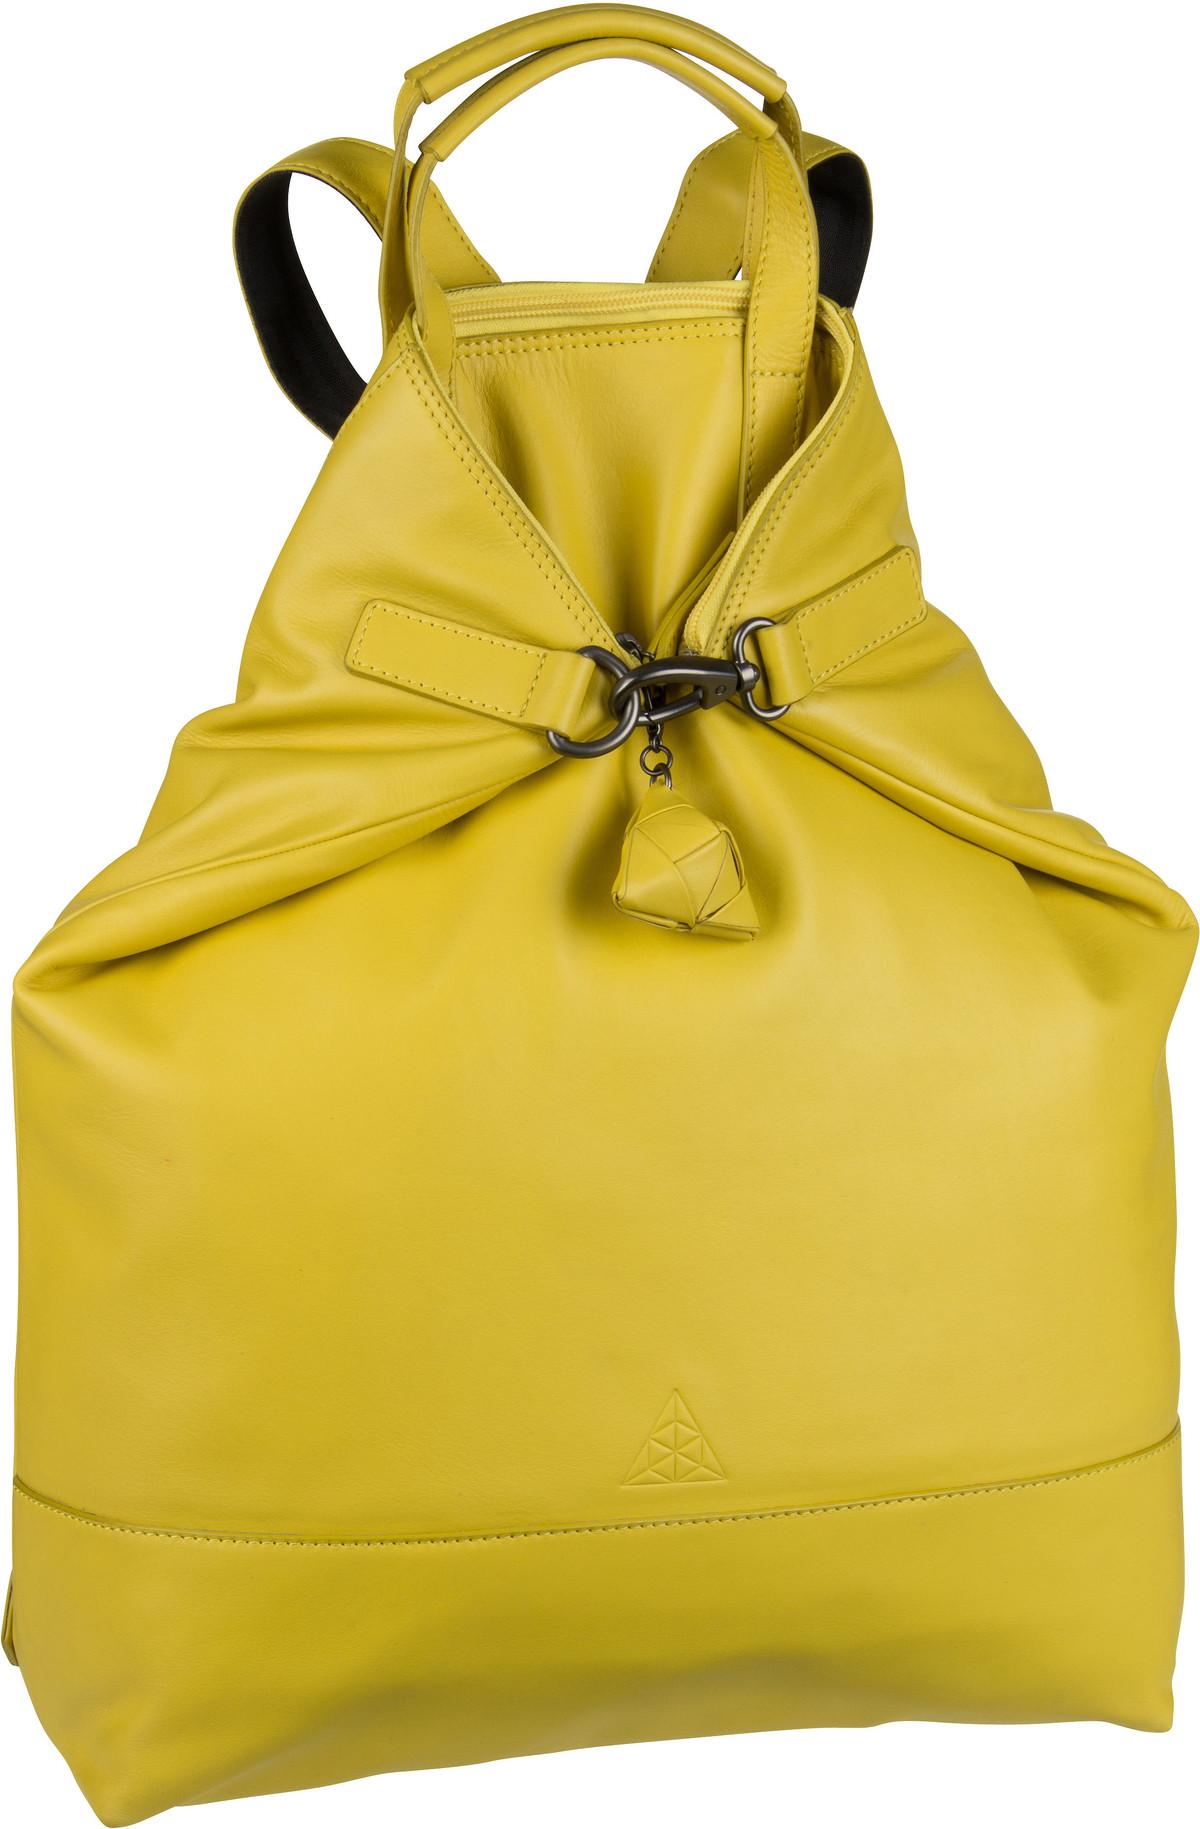 Rucksack / Daypack Alice Sara Ott 6013 X-Change 3in1 Bag L Gelb